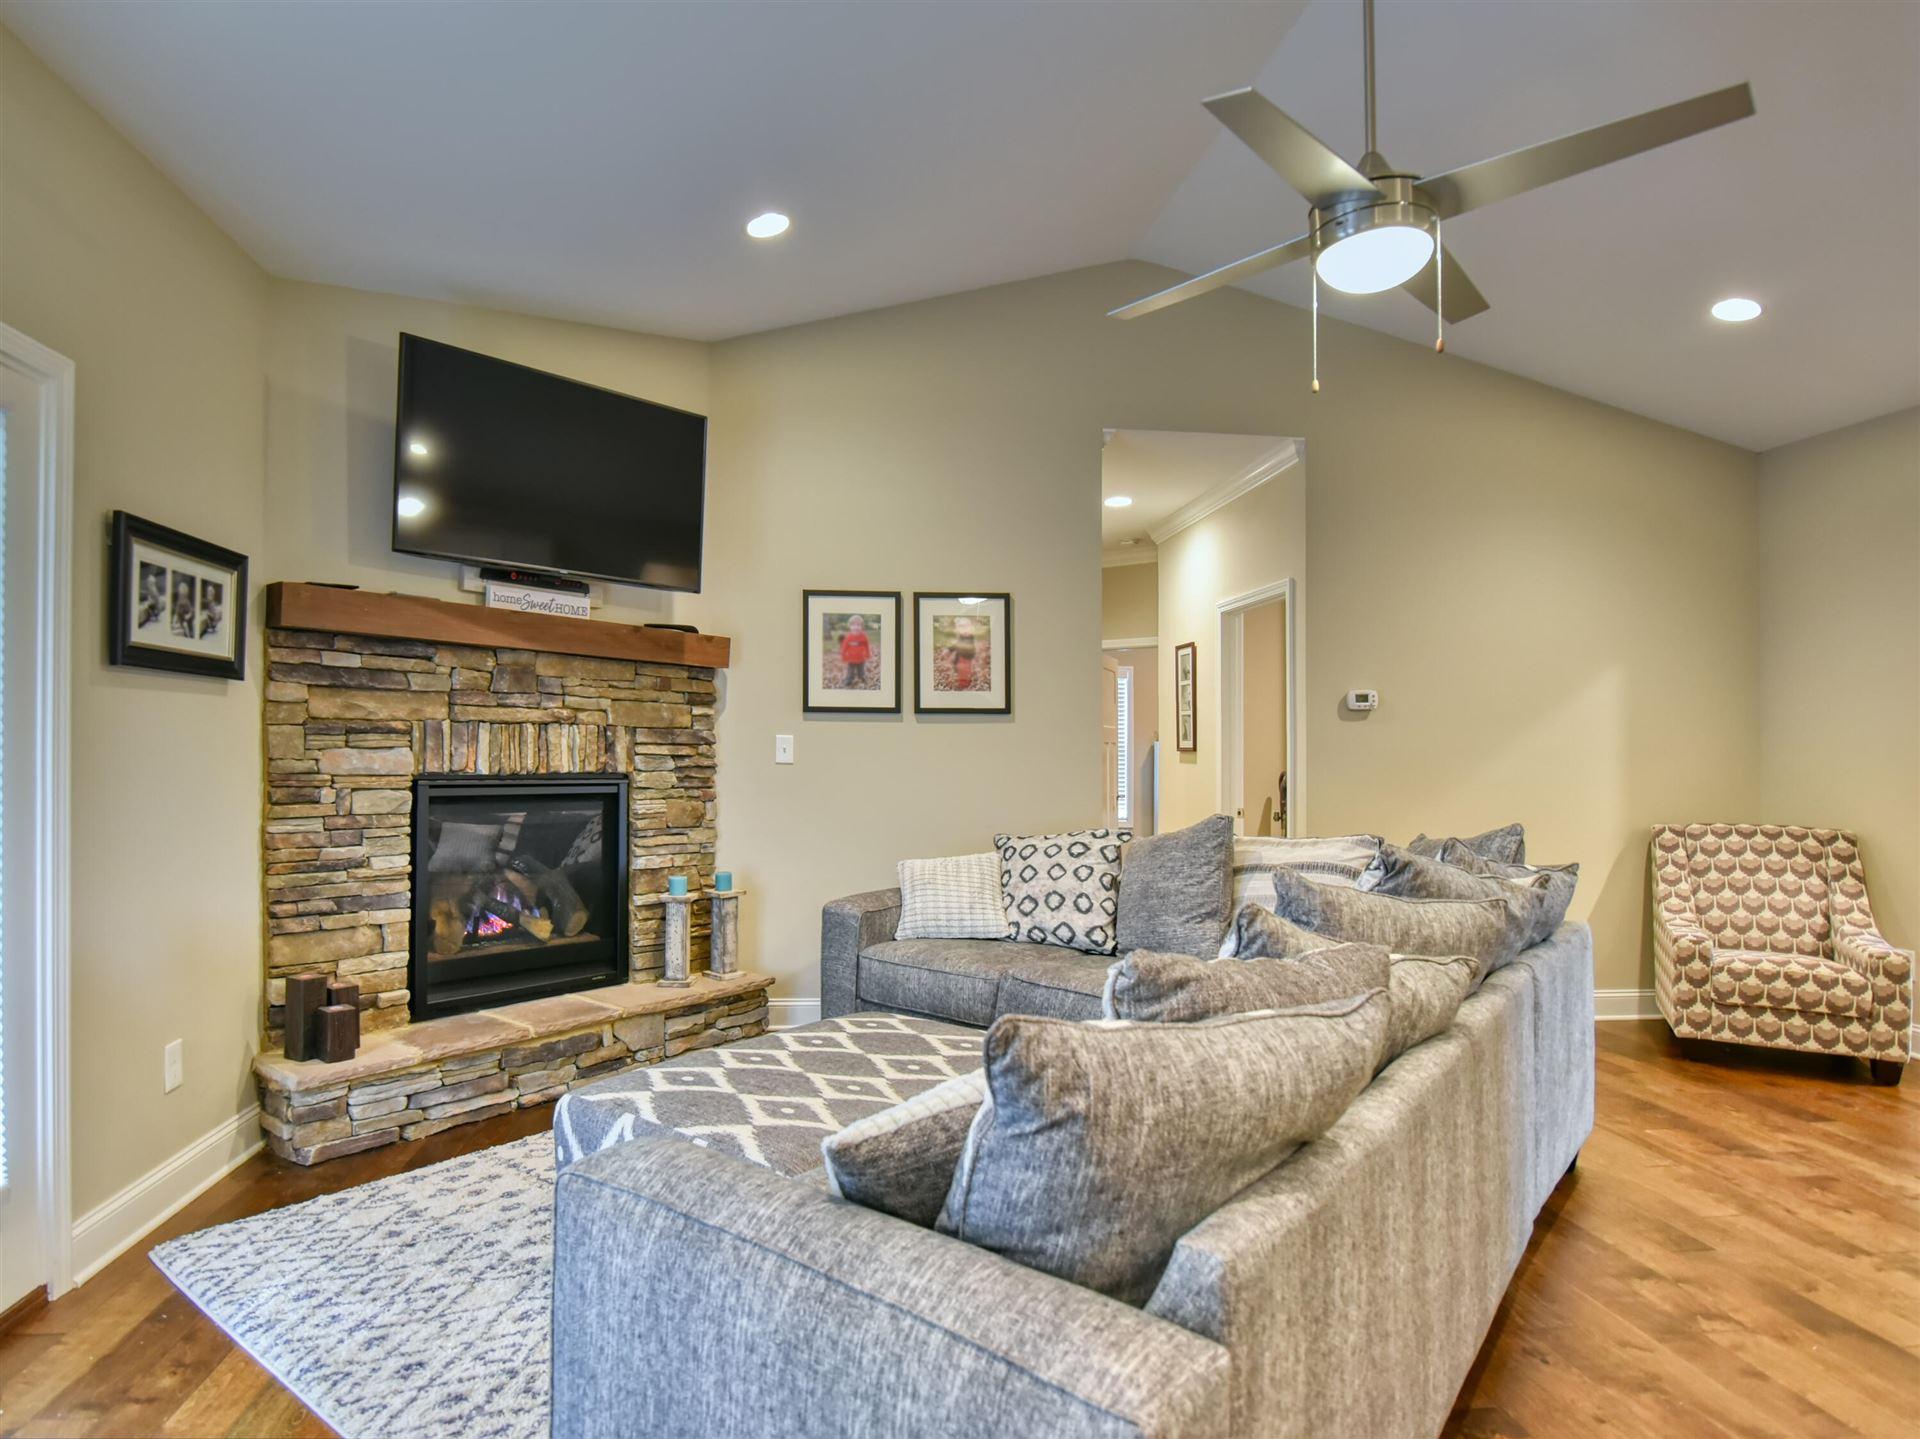 Photo of 3437 Windmead Lane, Knoxville, TN 37938 (MLS # 1162554)